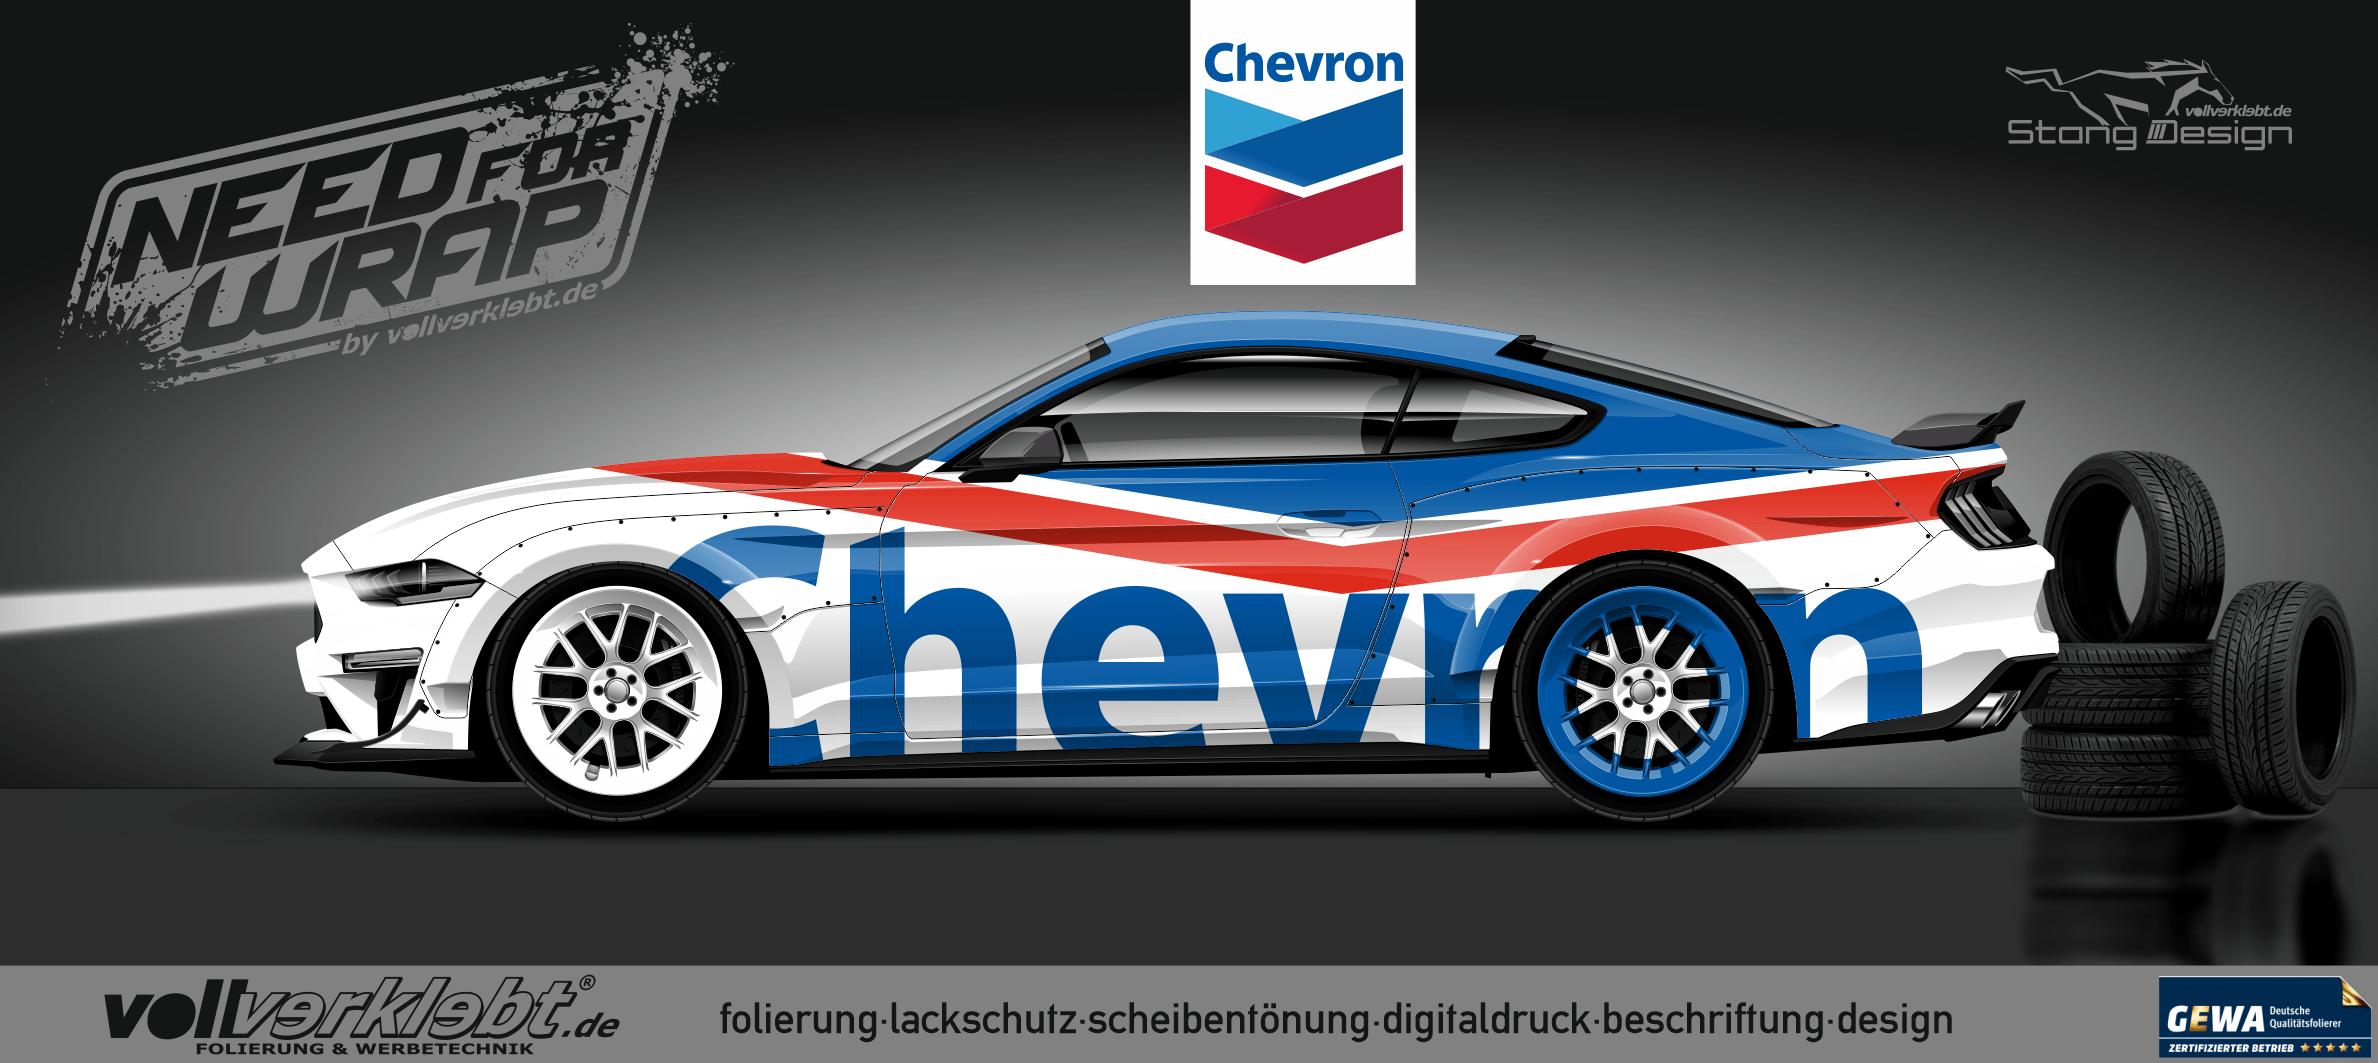 Chevron Mustang